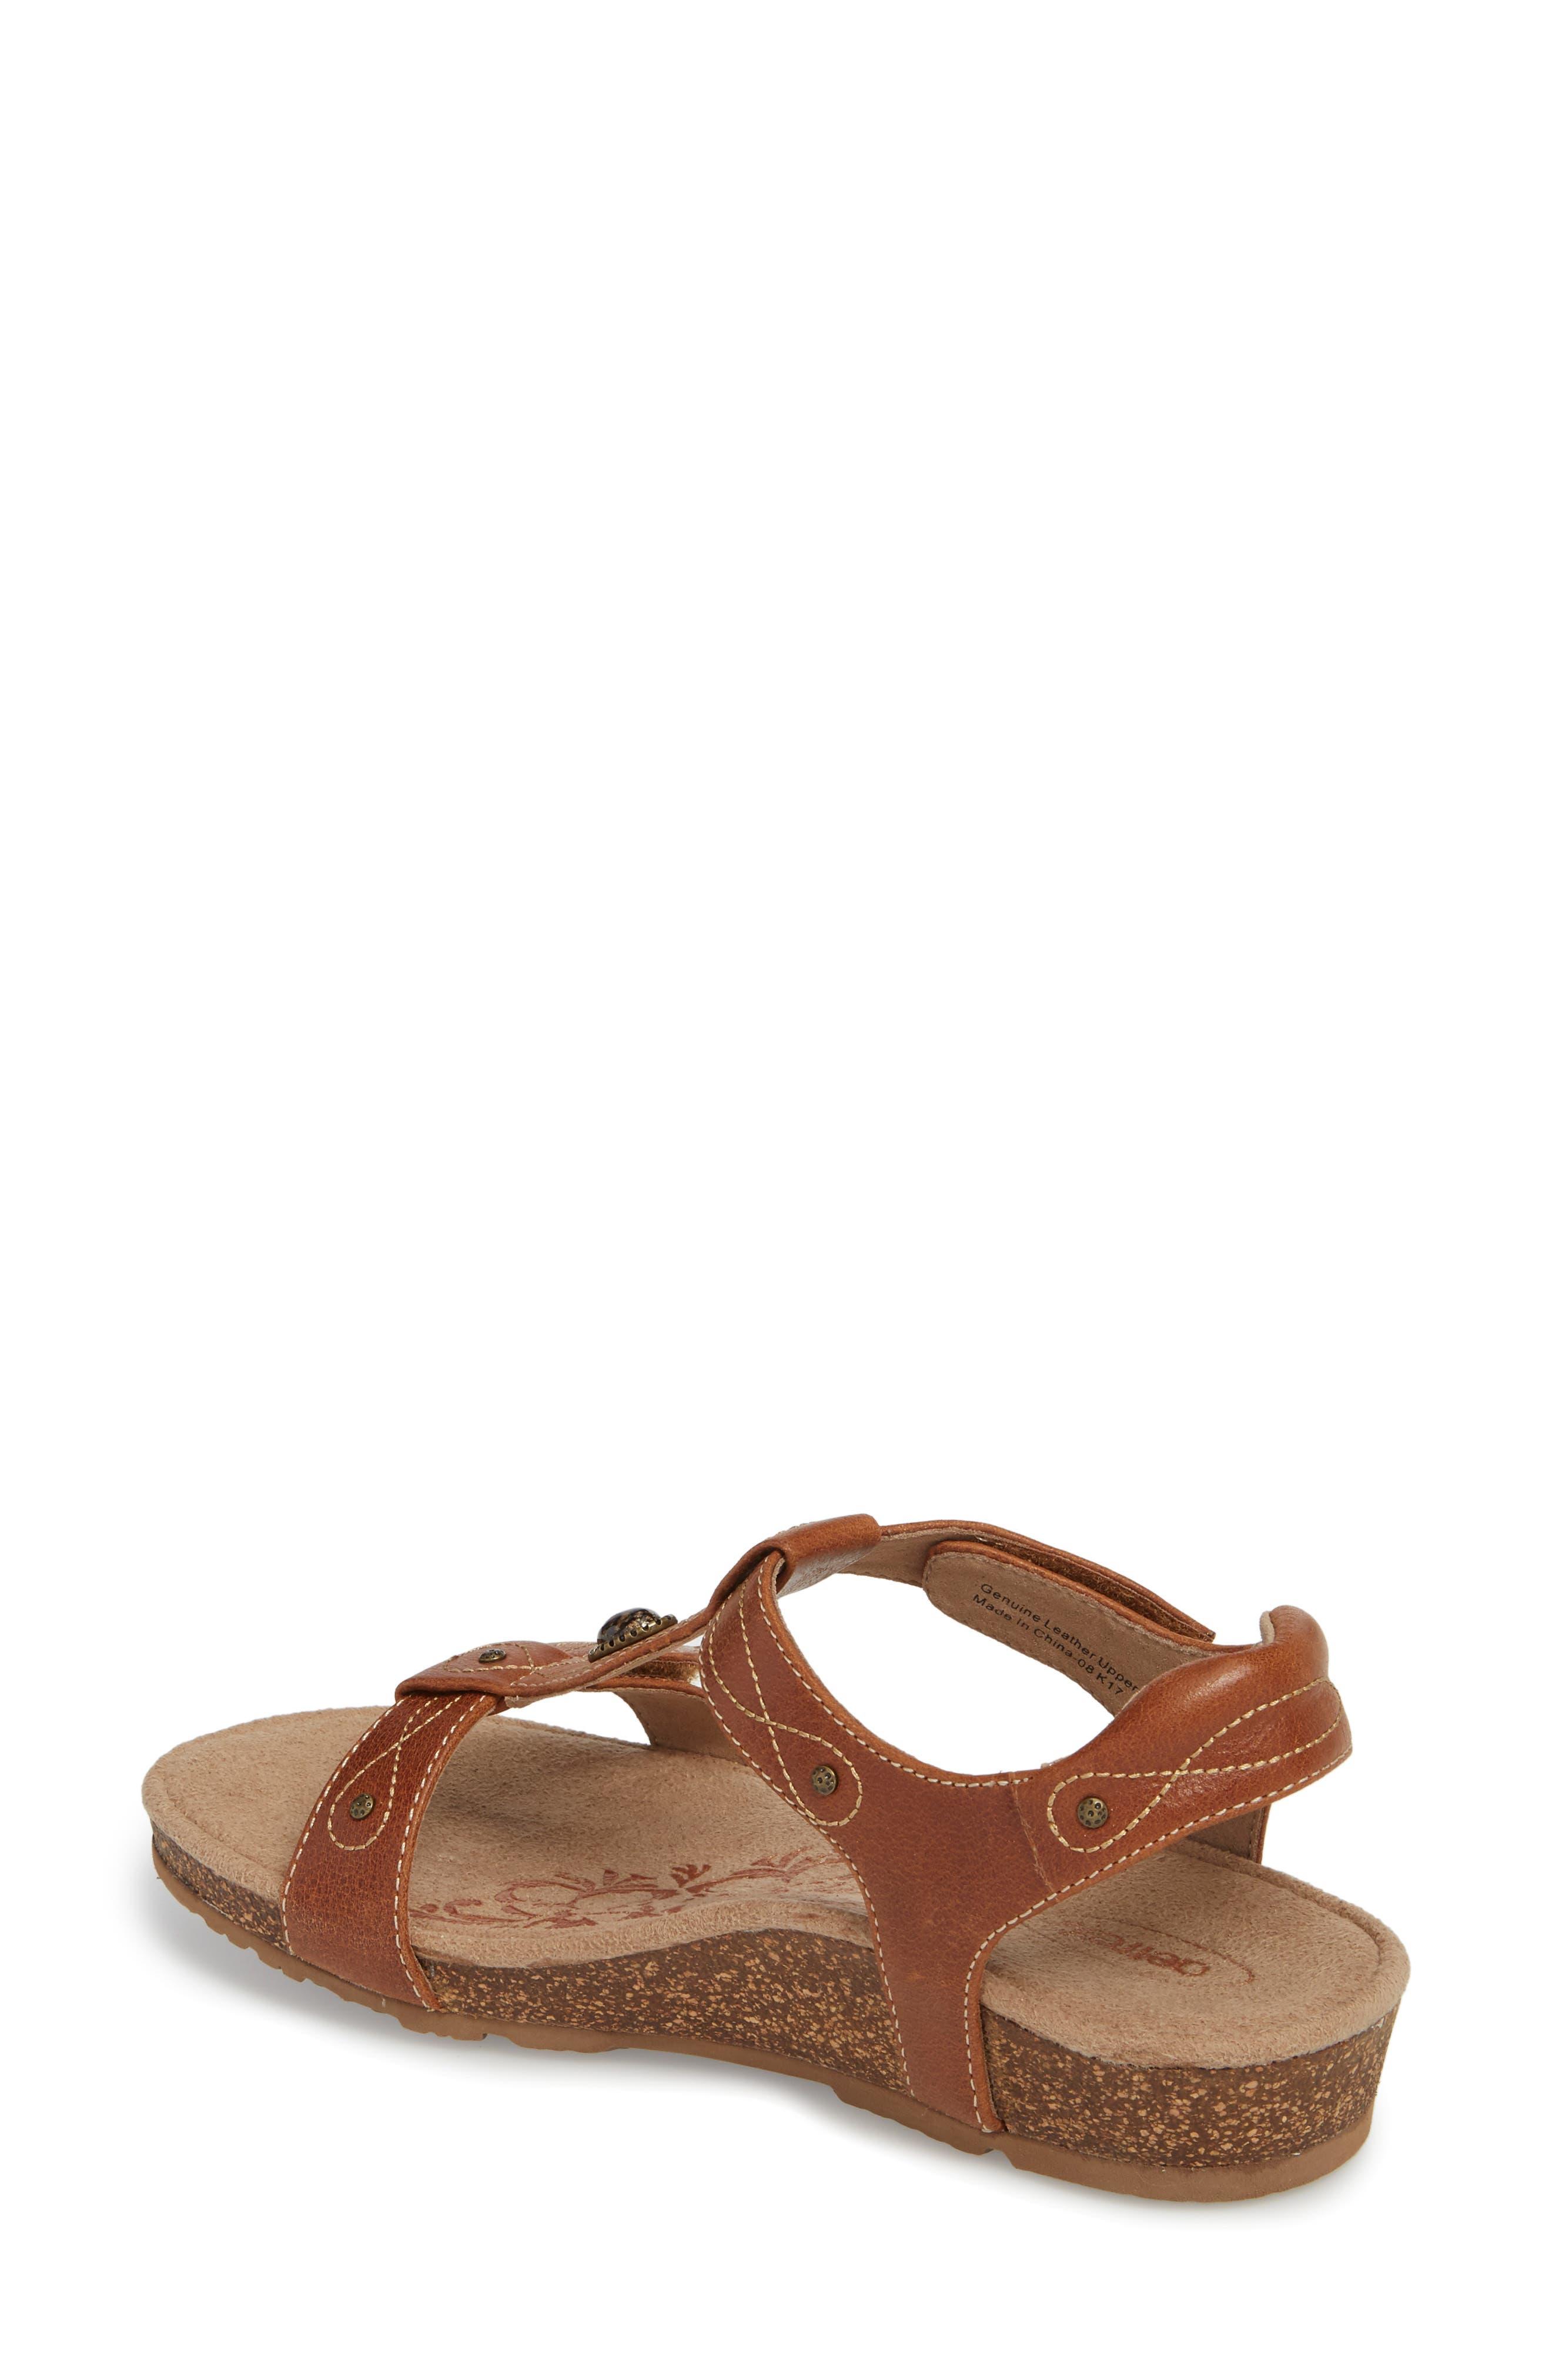 'Lori' Sandal,                             Alternate thumbnail 2, color,                             Cognac Leather